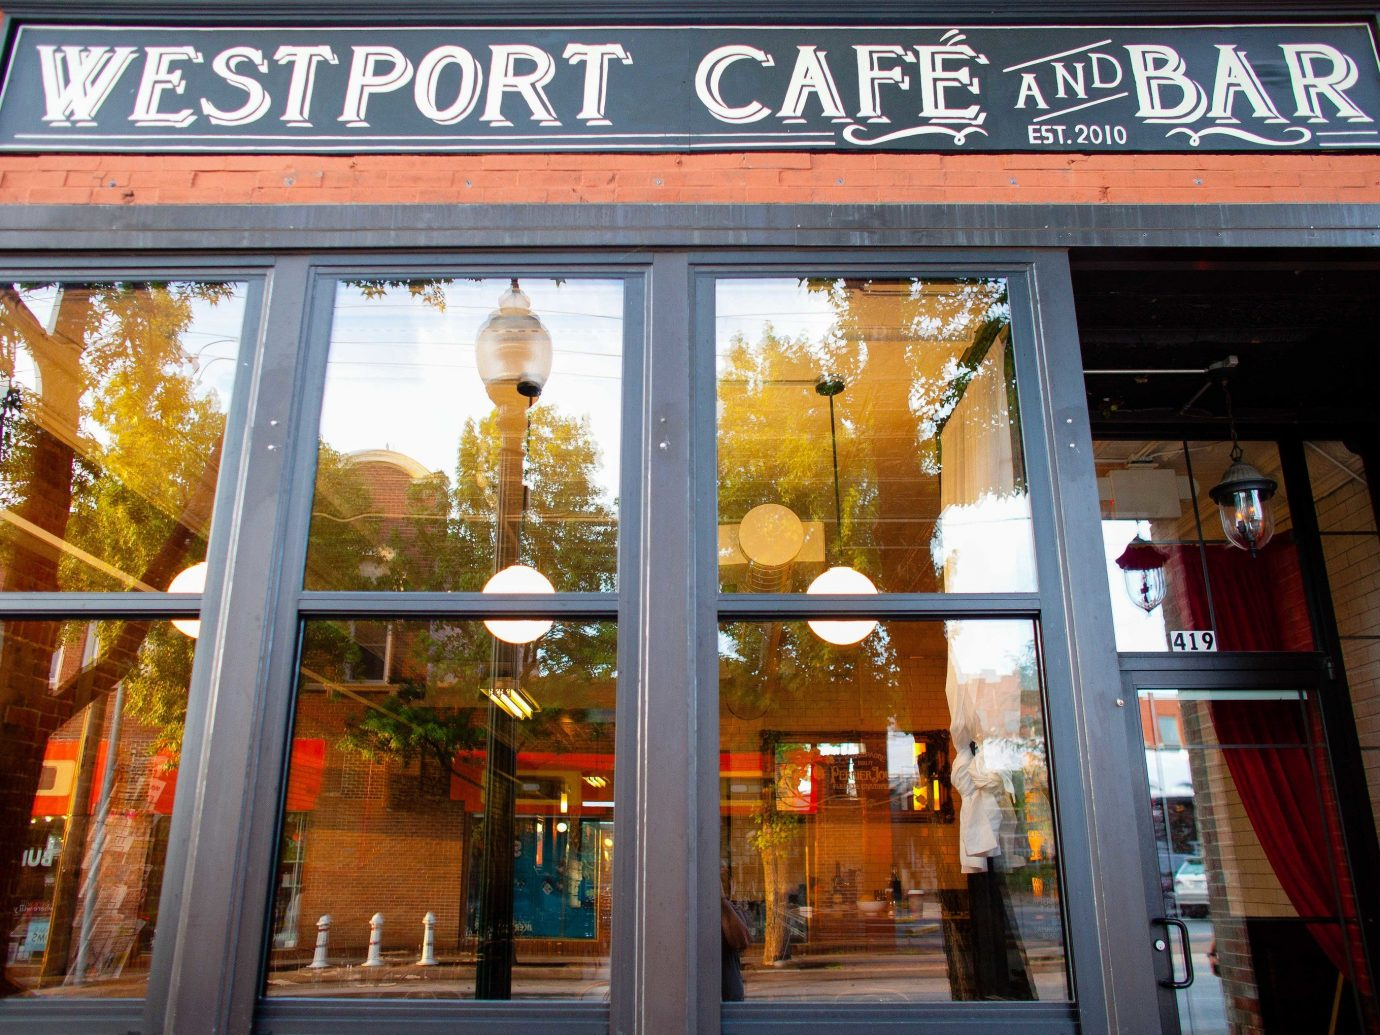 Kansas City Midwest Trip Ideas outdoor retail display window window store facade building City Shop restaurant